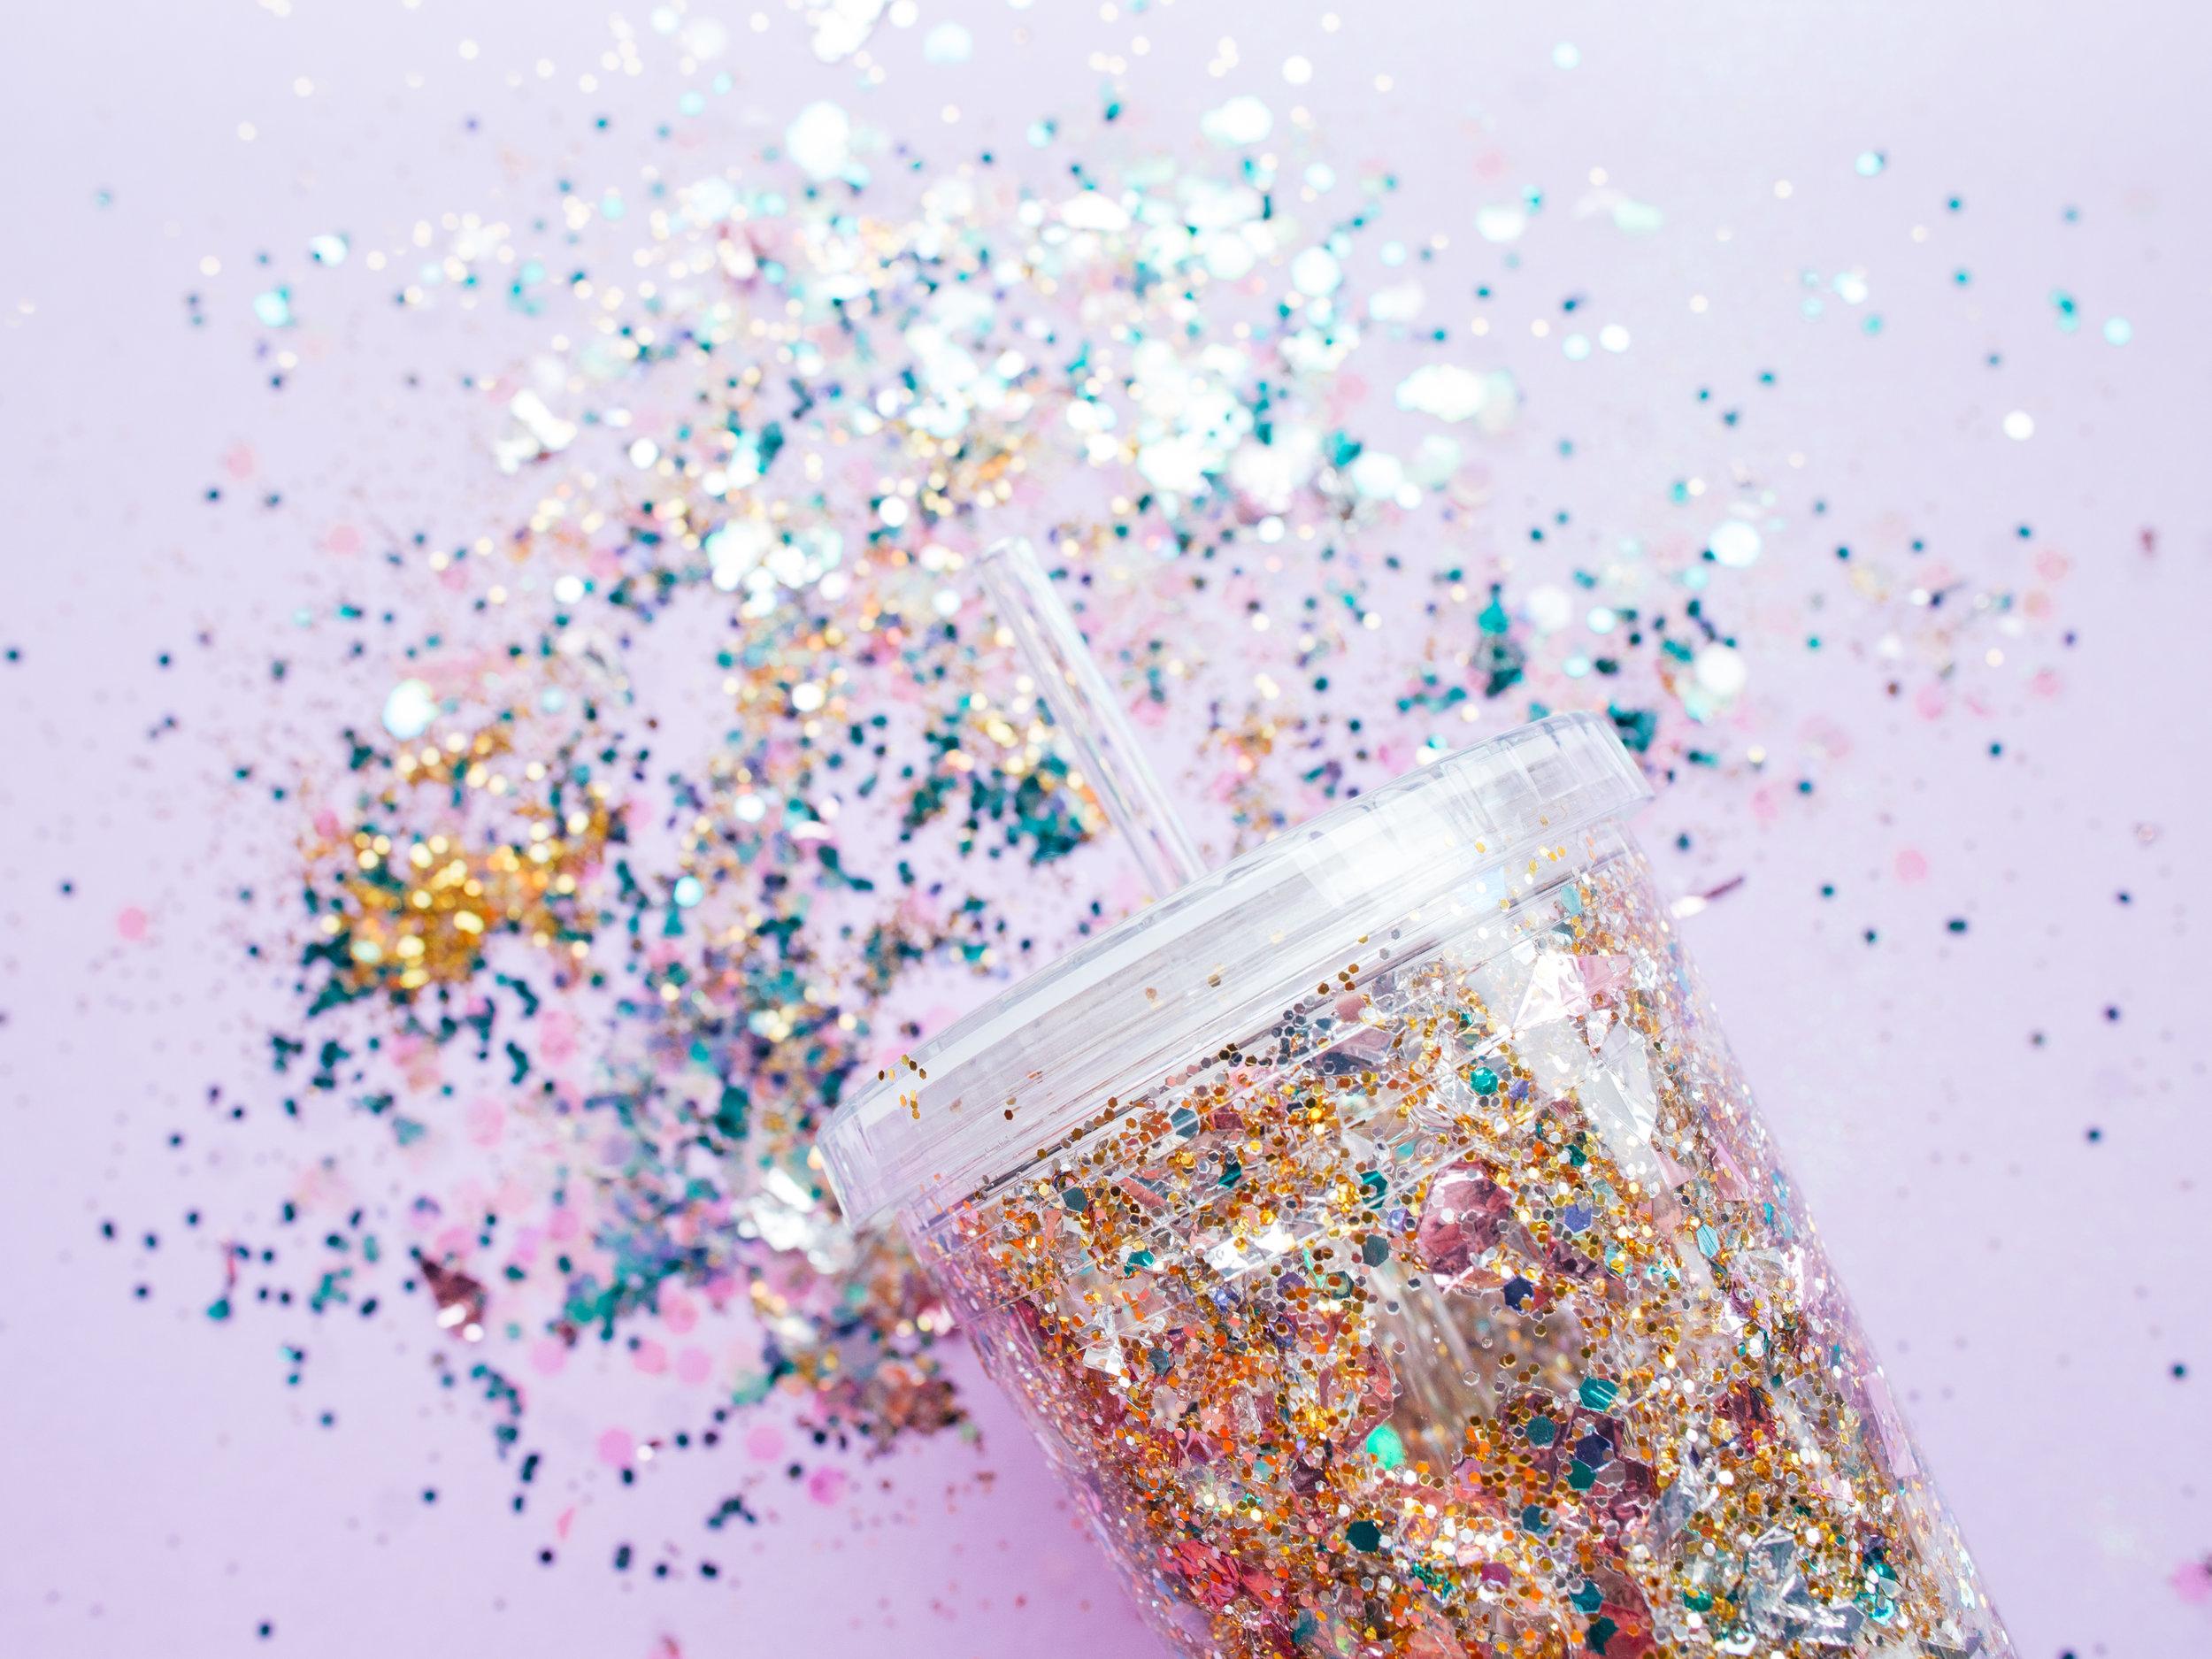 Paper Craft Pantry Blog: Galentine's Glitter Tumbler D.I.Y.